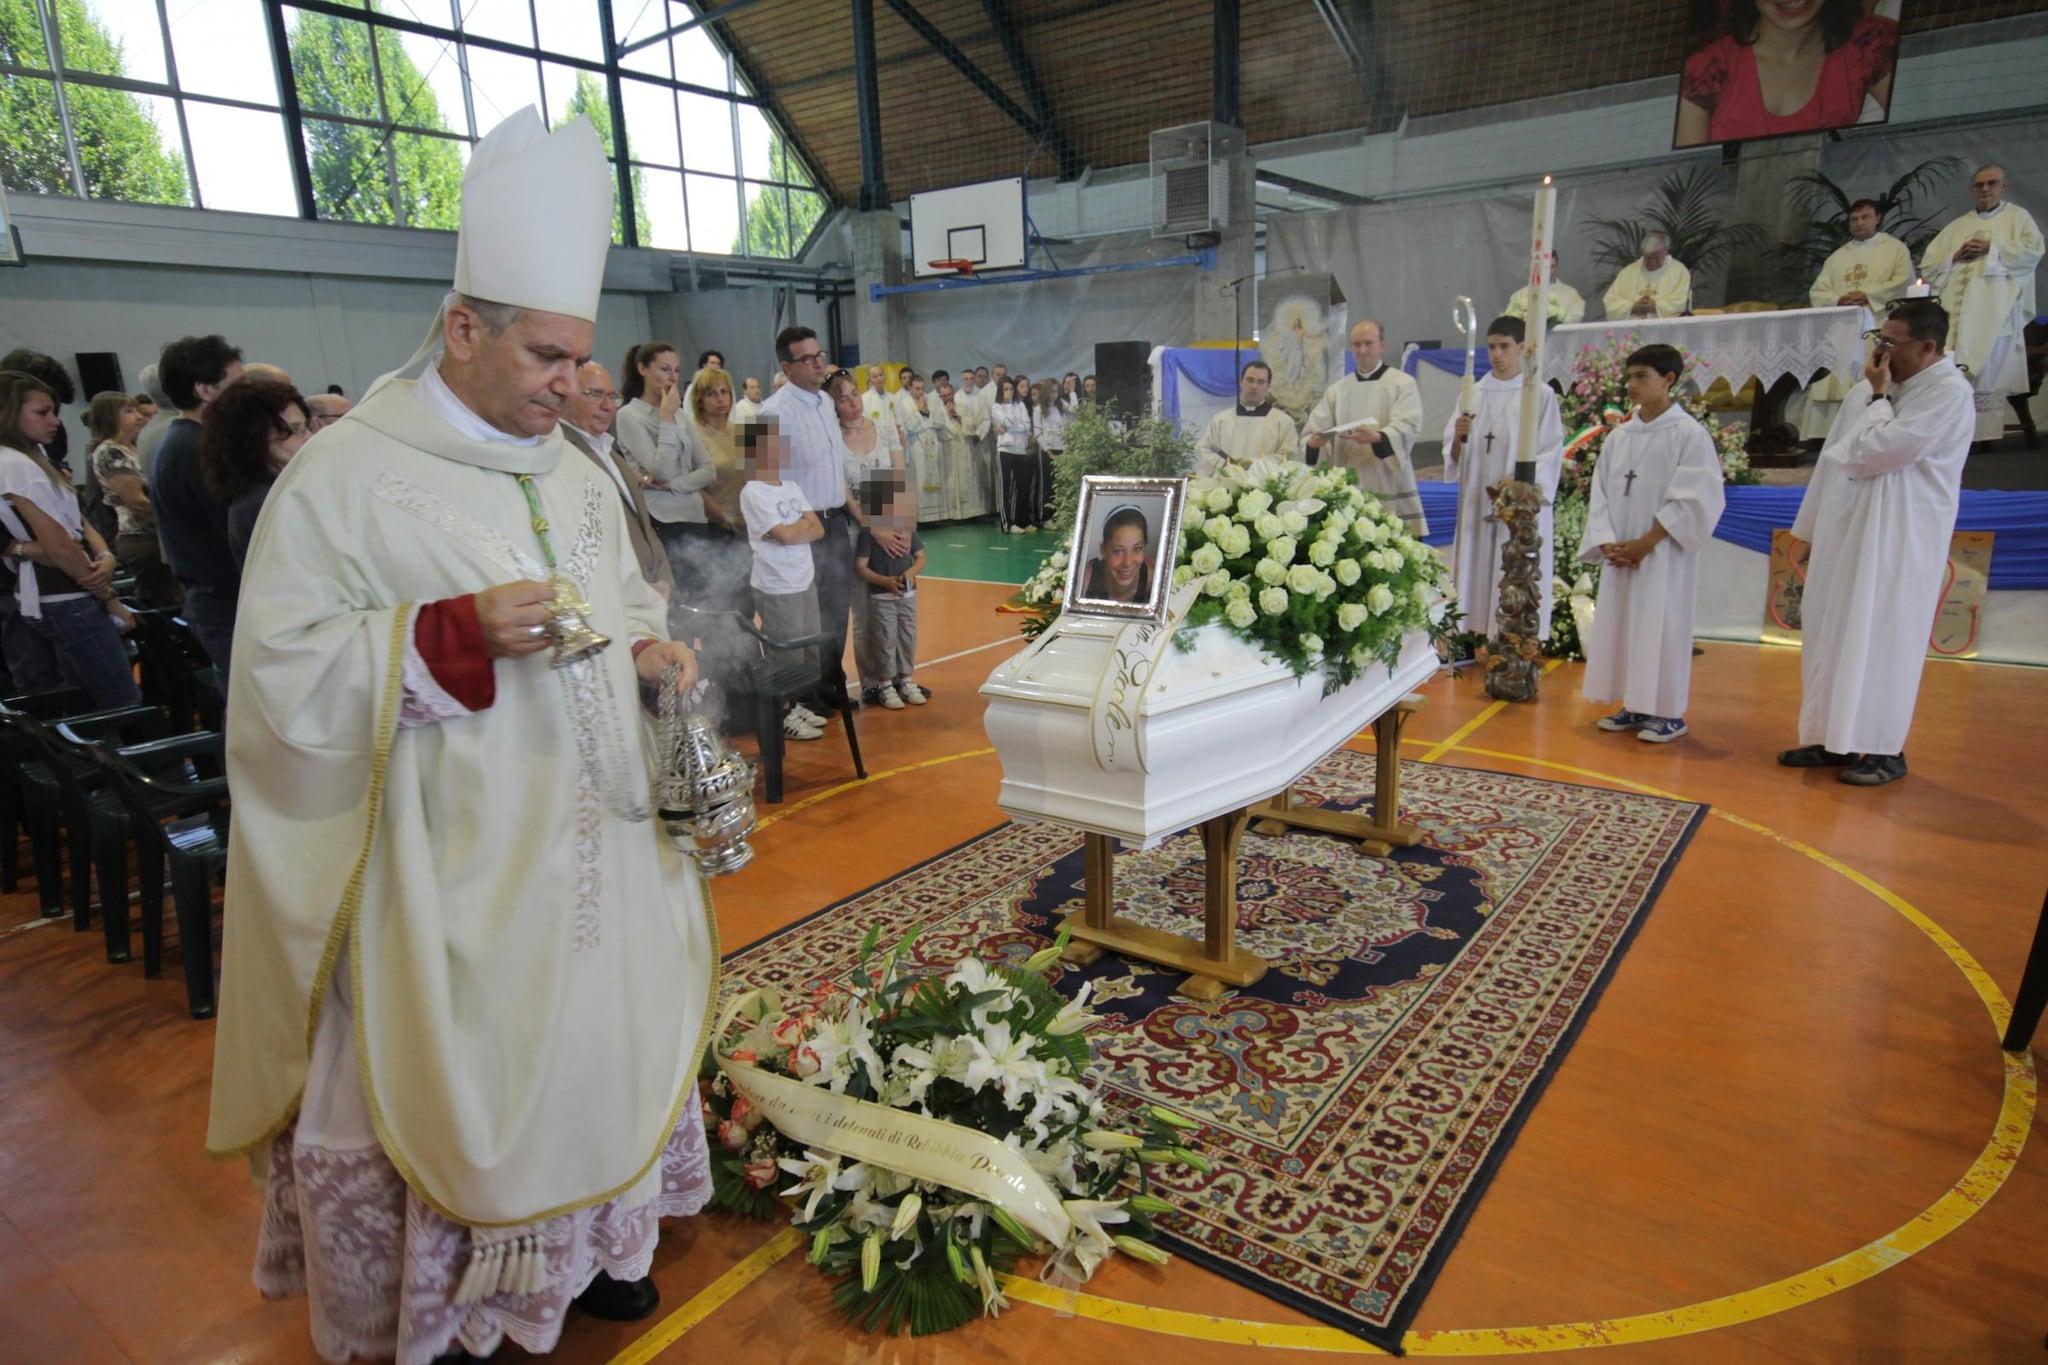 I funerali di Yara Gambirasio.